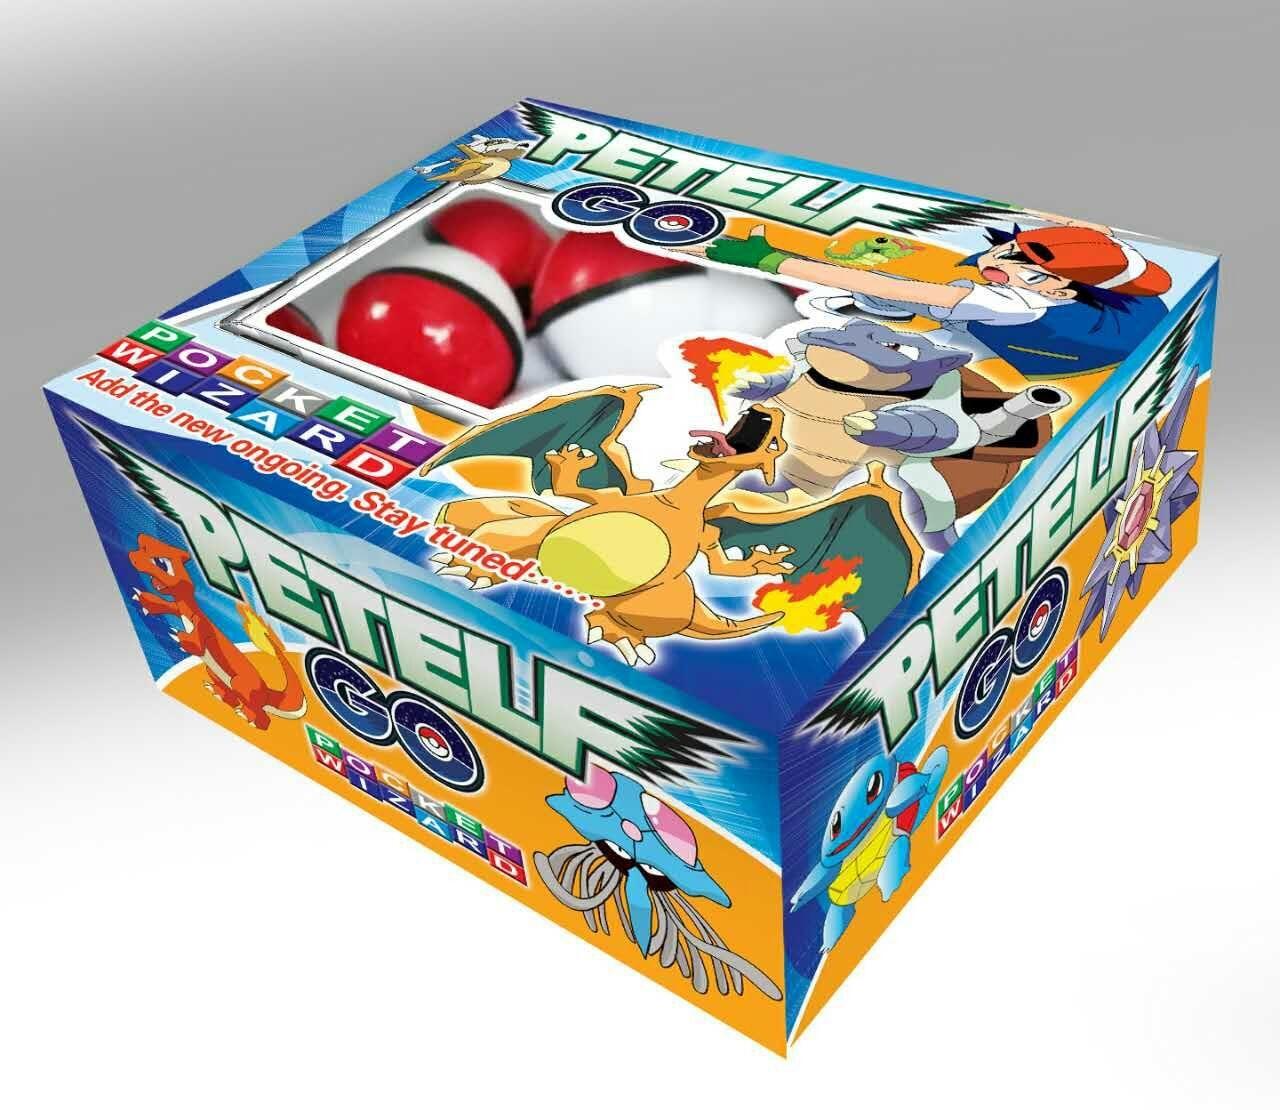 TAKARA TOMY 36pcs/set 3cm Pokemon Poekeball Original Toys Hobbies Action Toy Figures For Children Christmas Gift